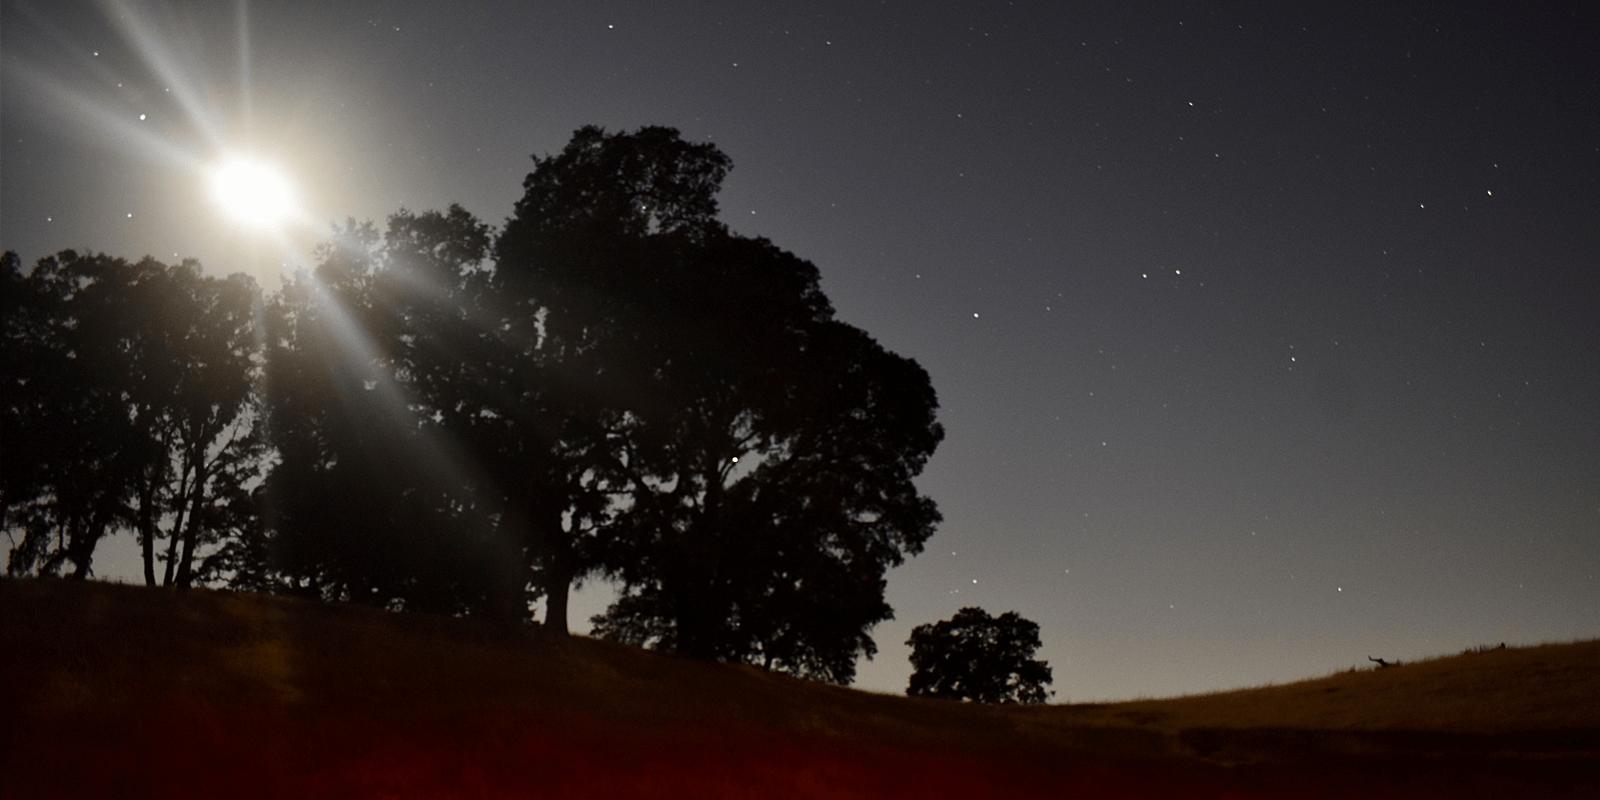 oak trees under a full moon